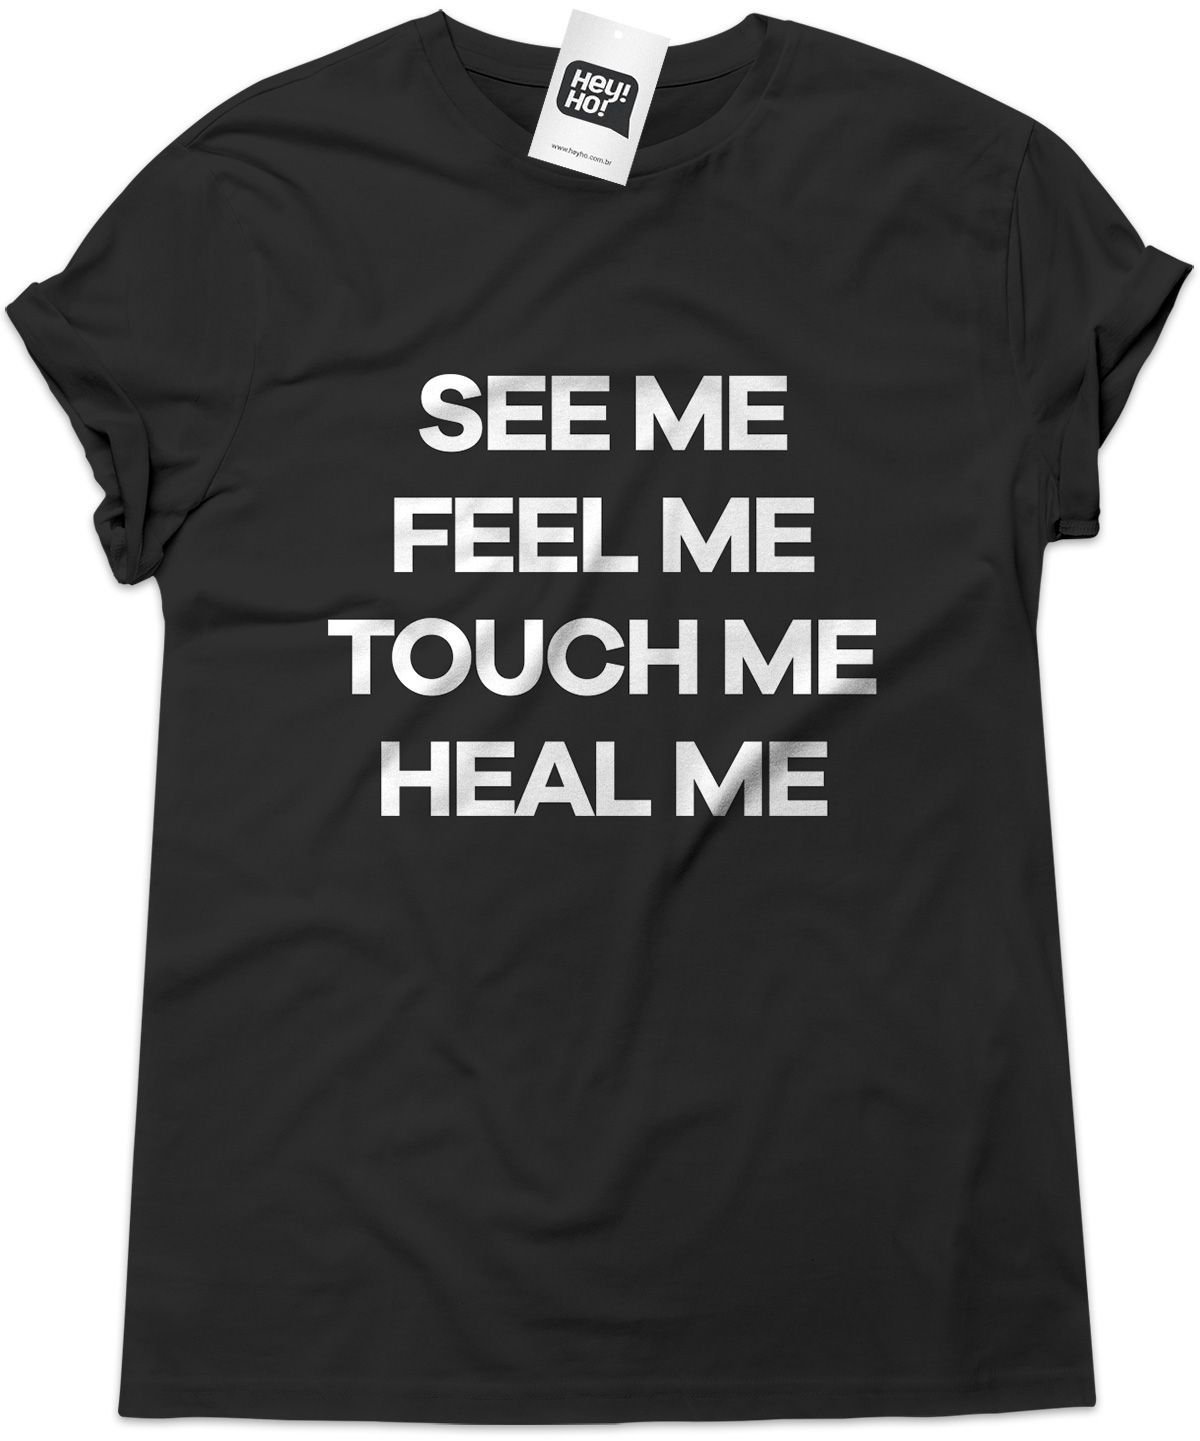 THE WHO - See me Feel me